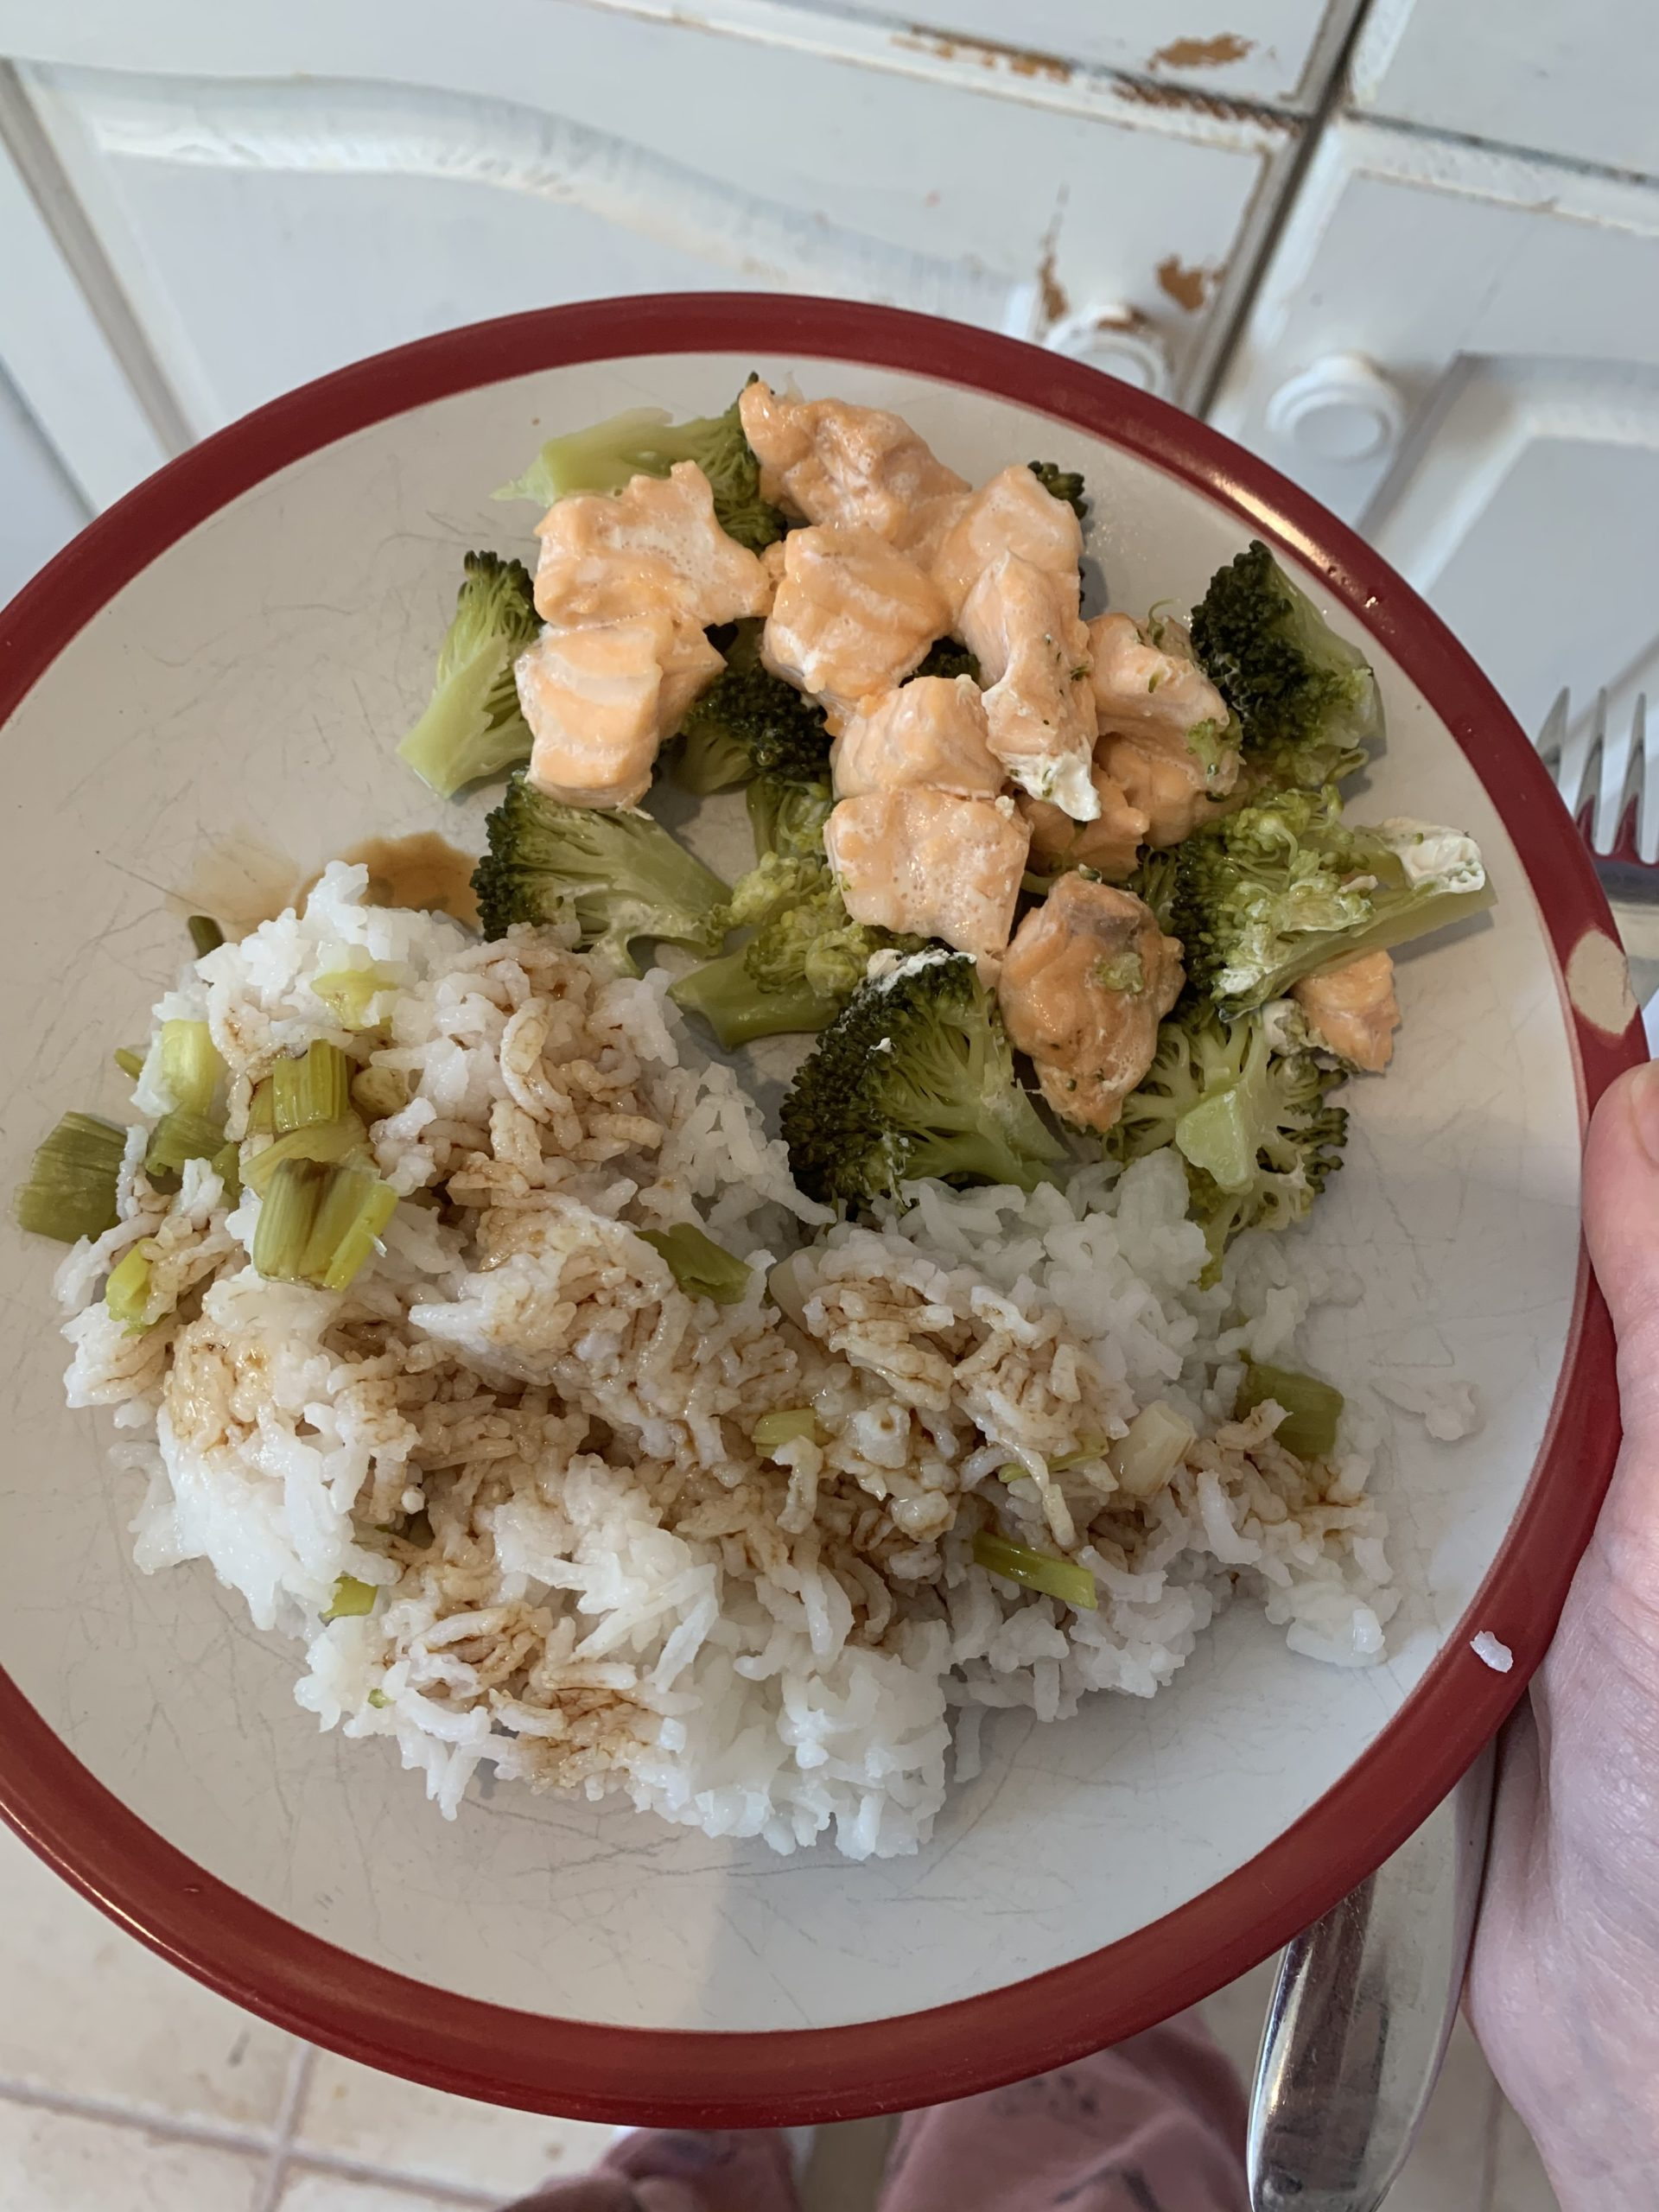 itaki pro lunch box steamer review